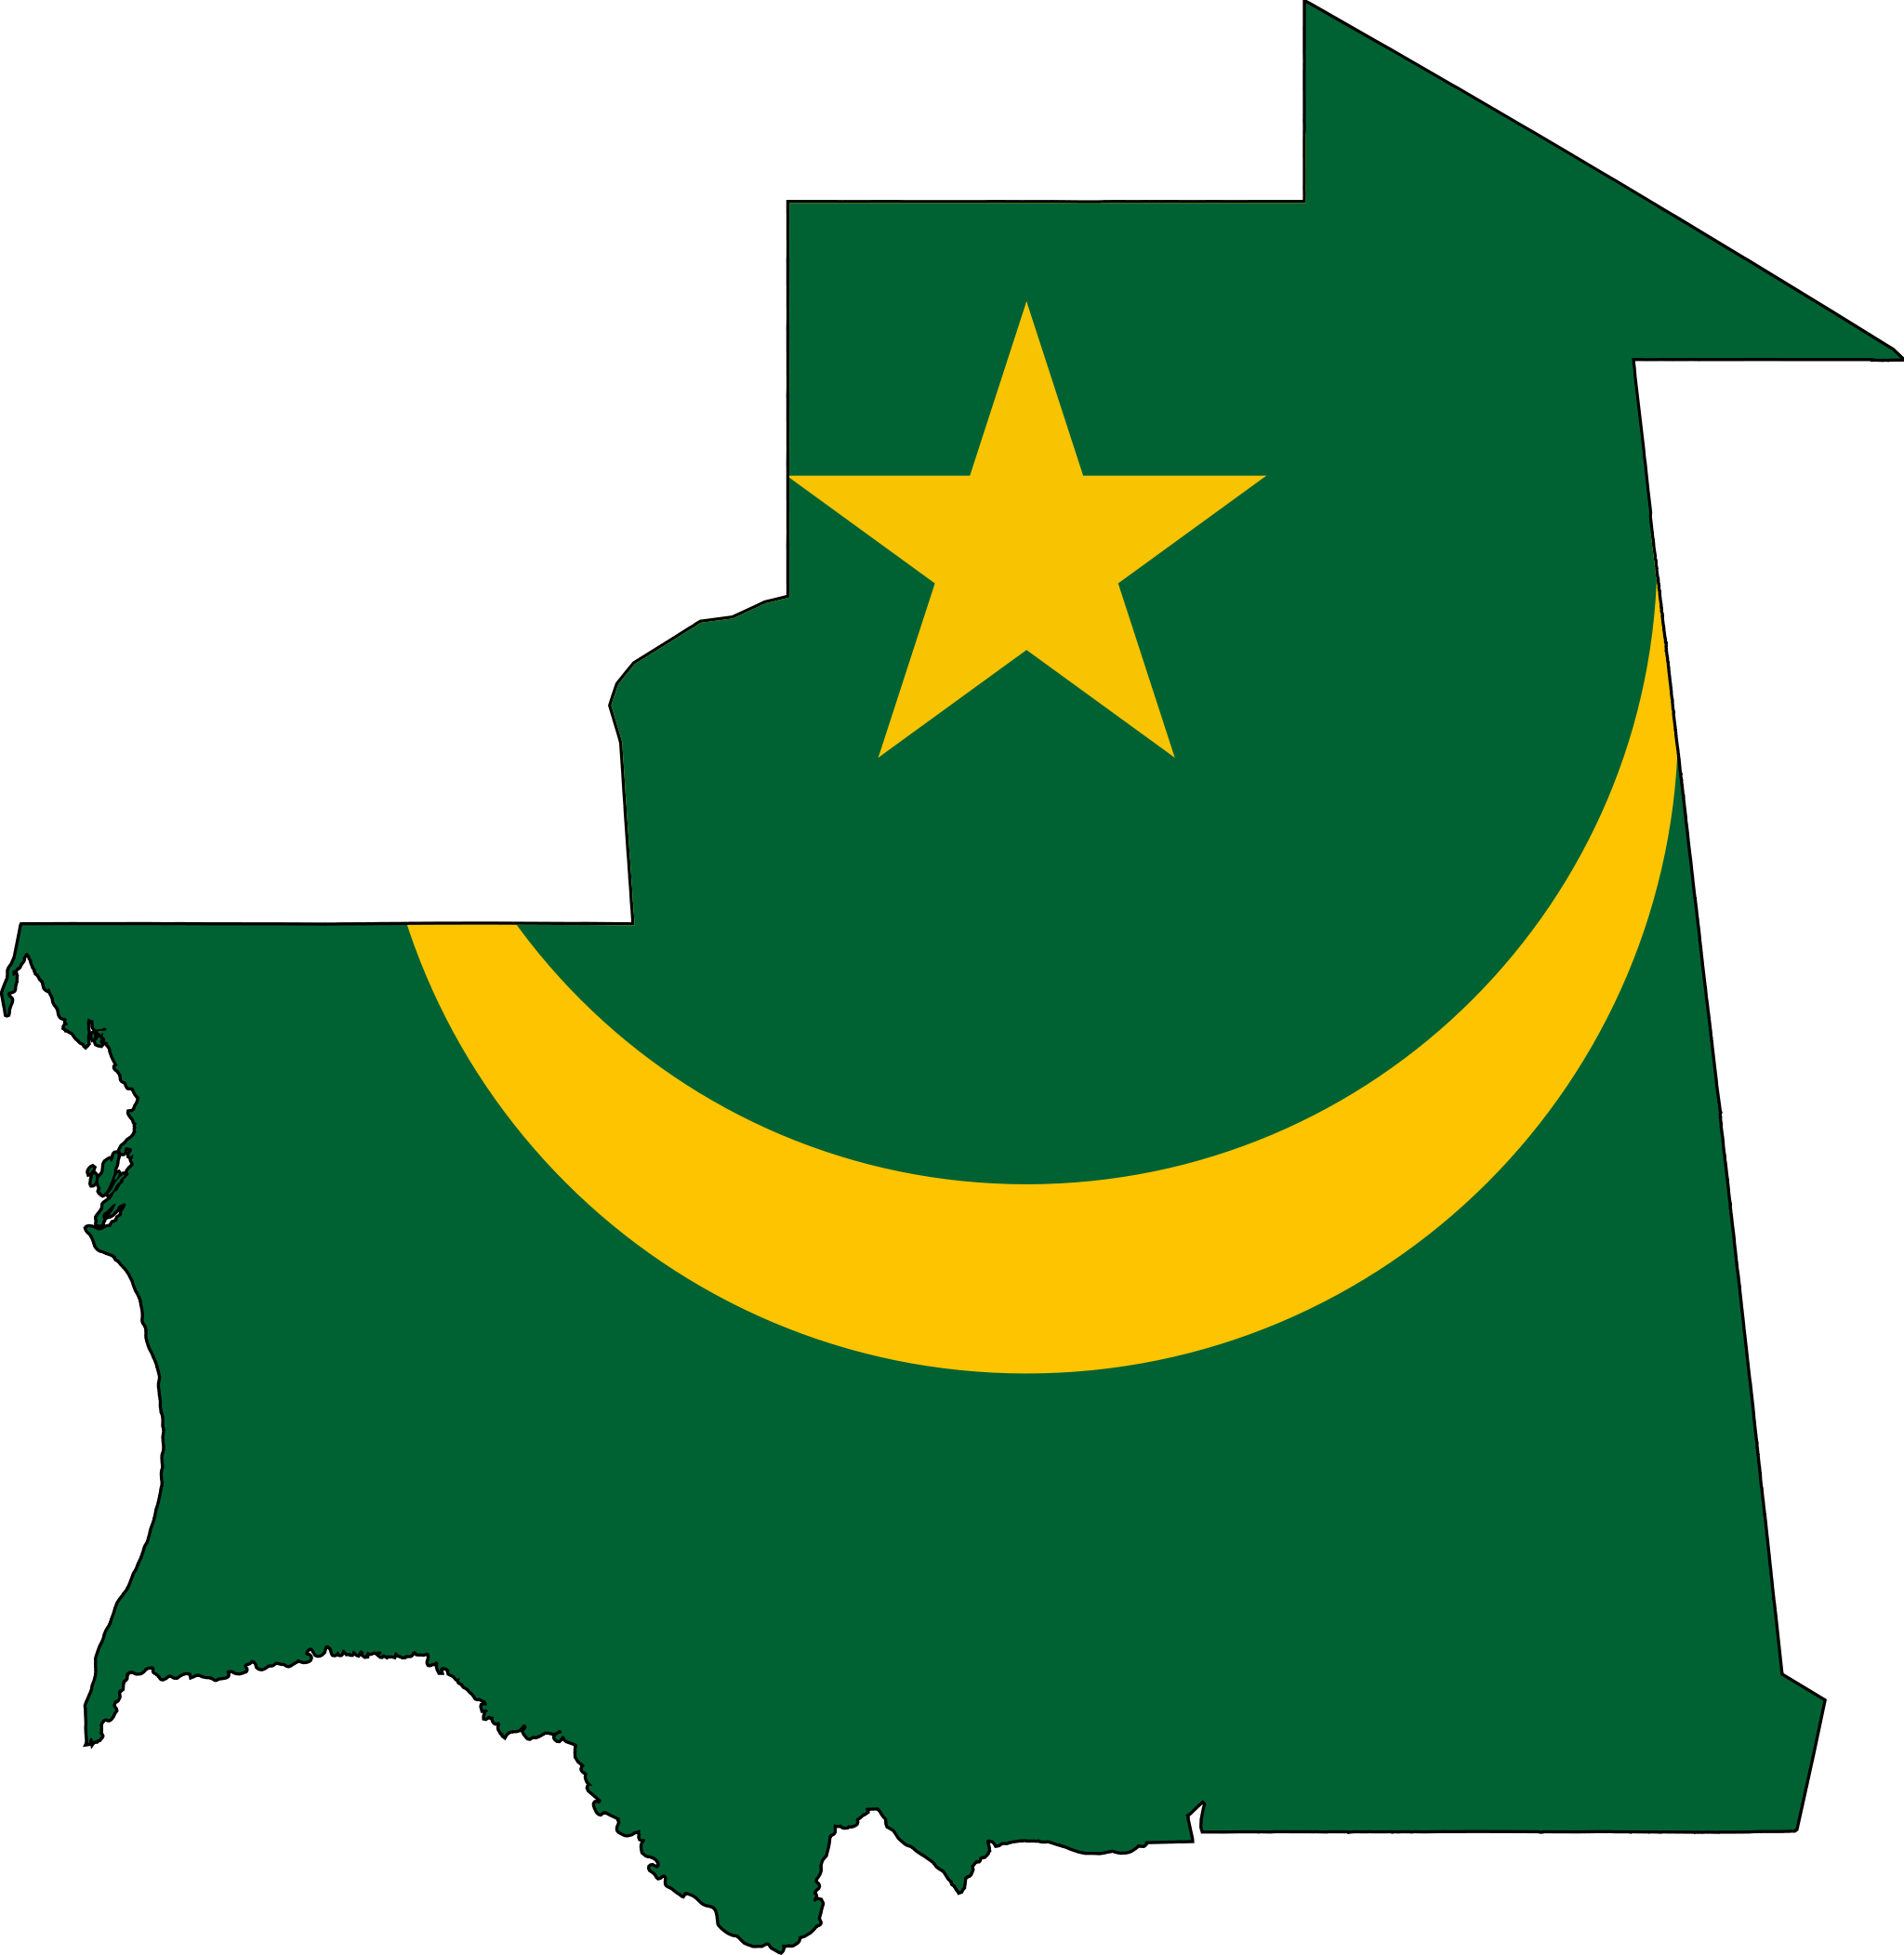 Mauritania_bayrak_harita